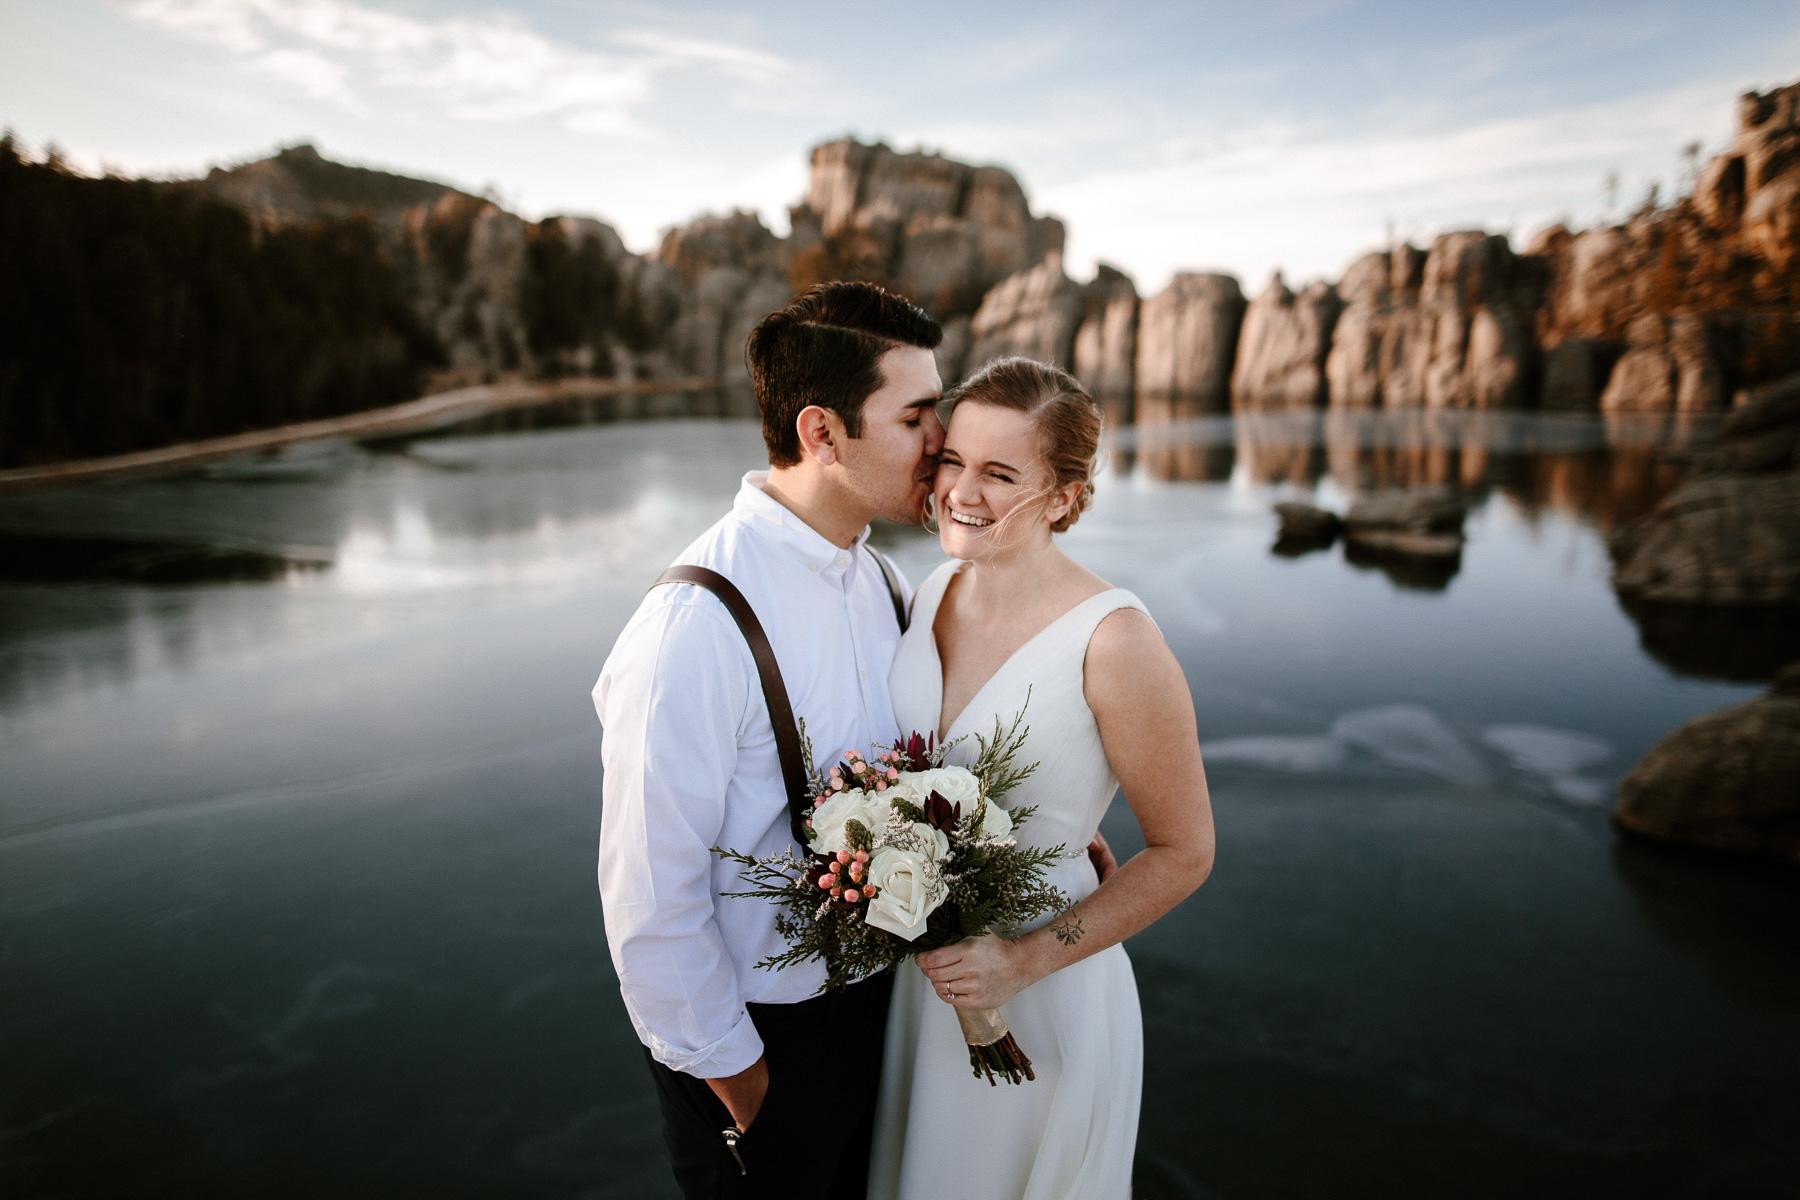 sioux-falls-black-hills-rapid-city-elopement-wedding-adventure-photographer-custer-sylvan-lake-28.jpg